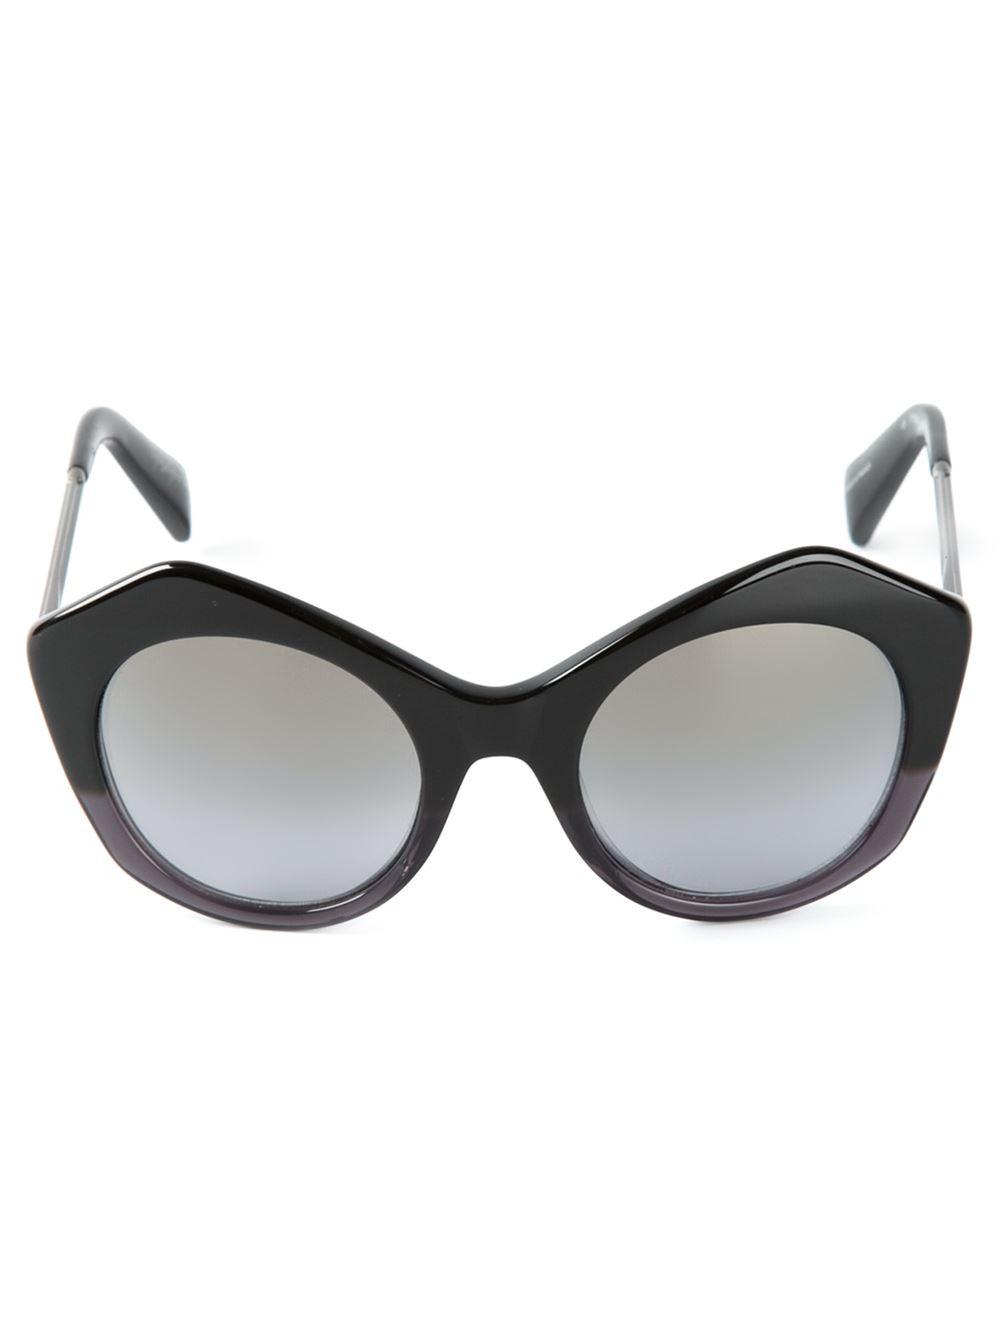 182fa59027 Lyst - Yohji Yamamoto Geometric Frames Sunglasses in Black